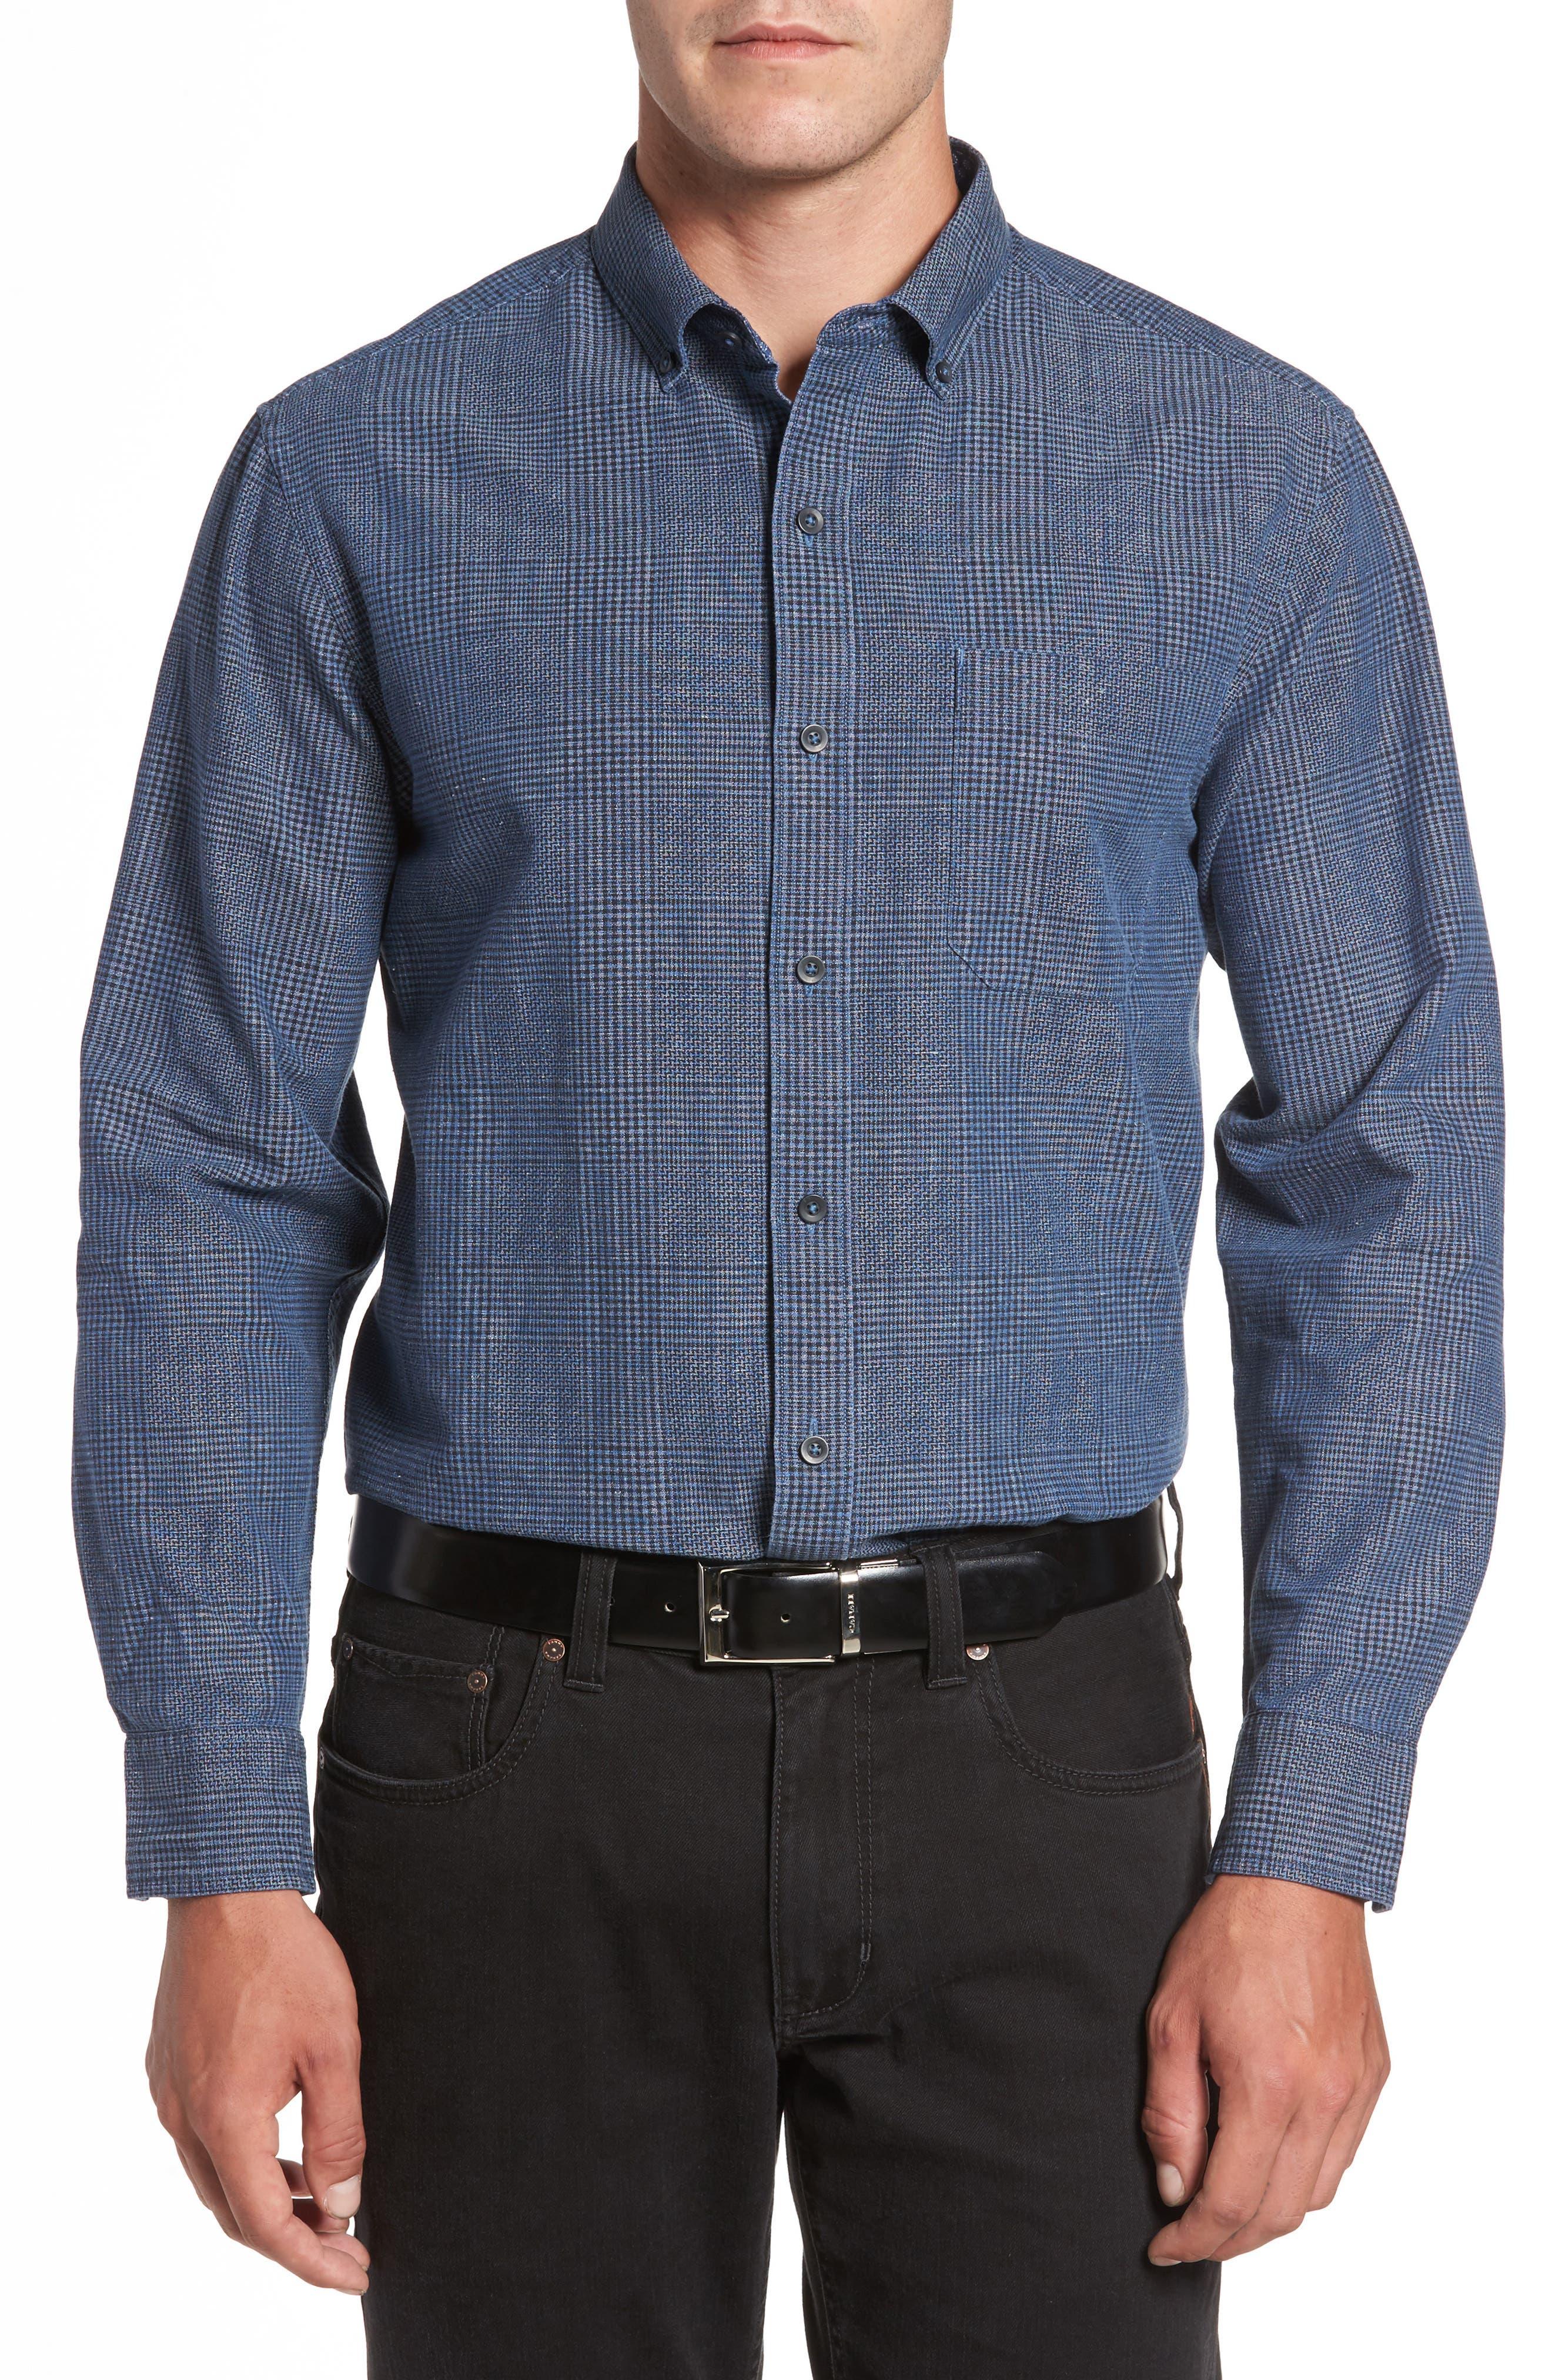 Main Image - Tommy Bahama Almeria Standard Fit Plaid Sport Shirt